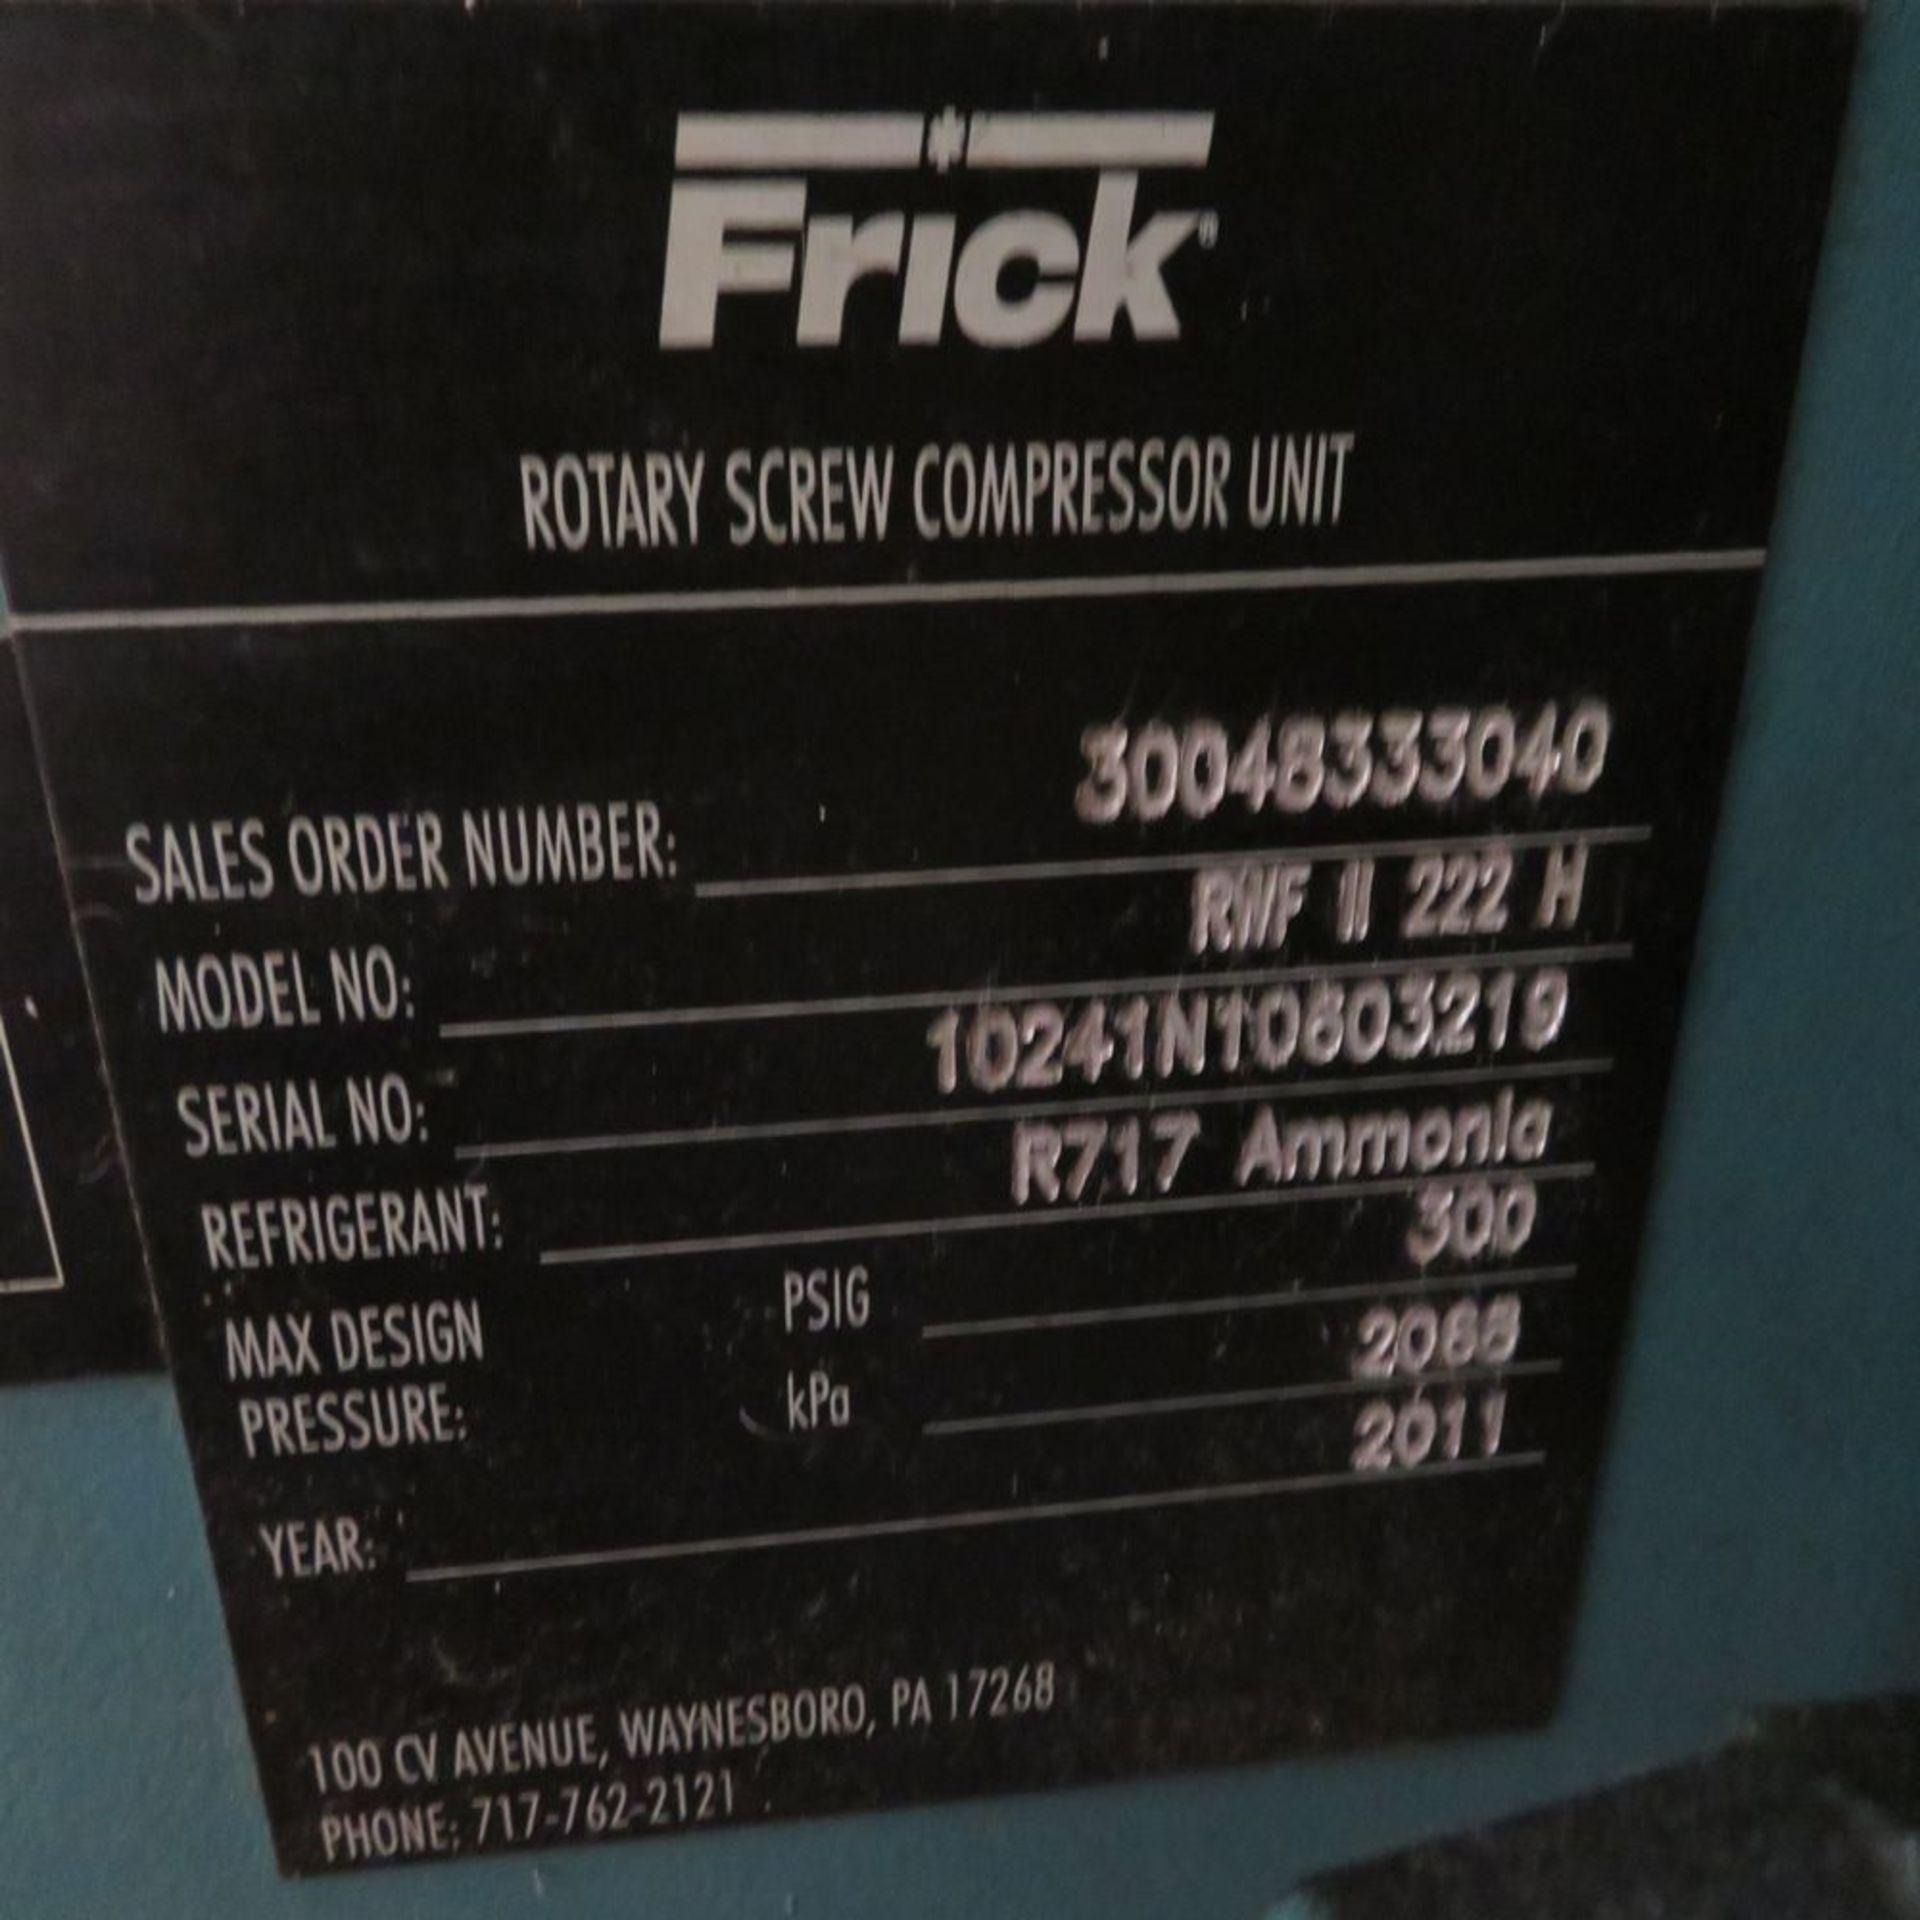 (2011) Frick mod. RWF11222H, 570hp Rotary - Image 8 of 8